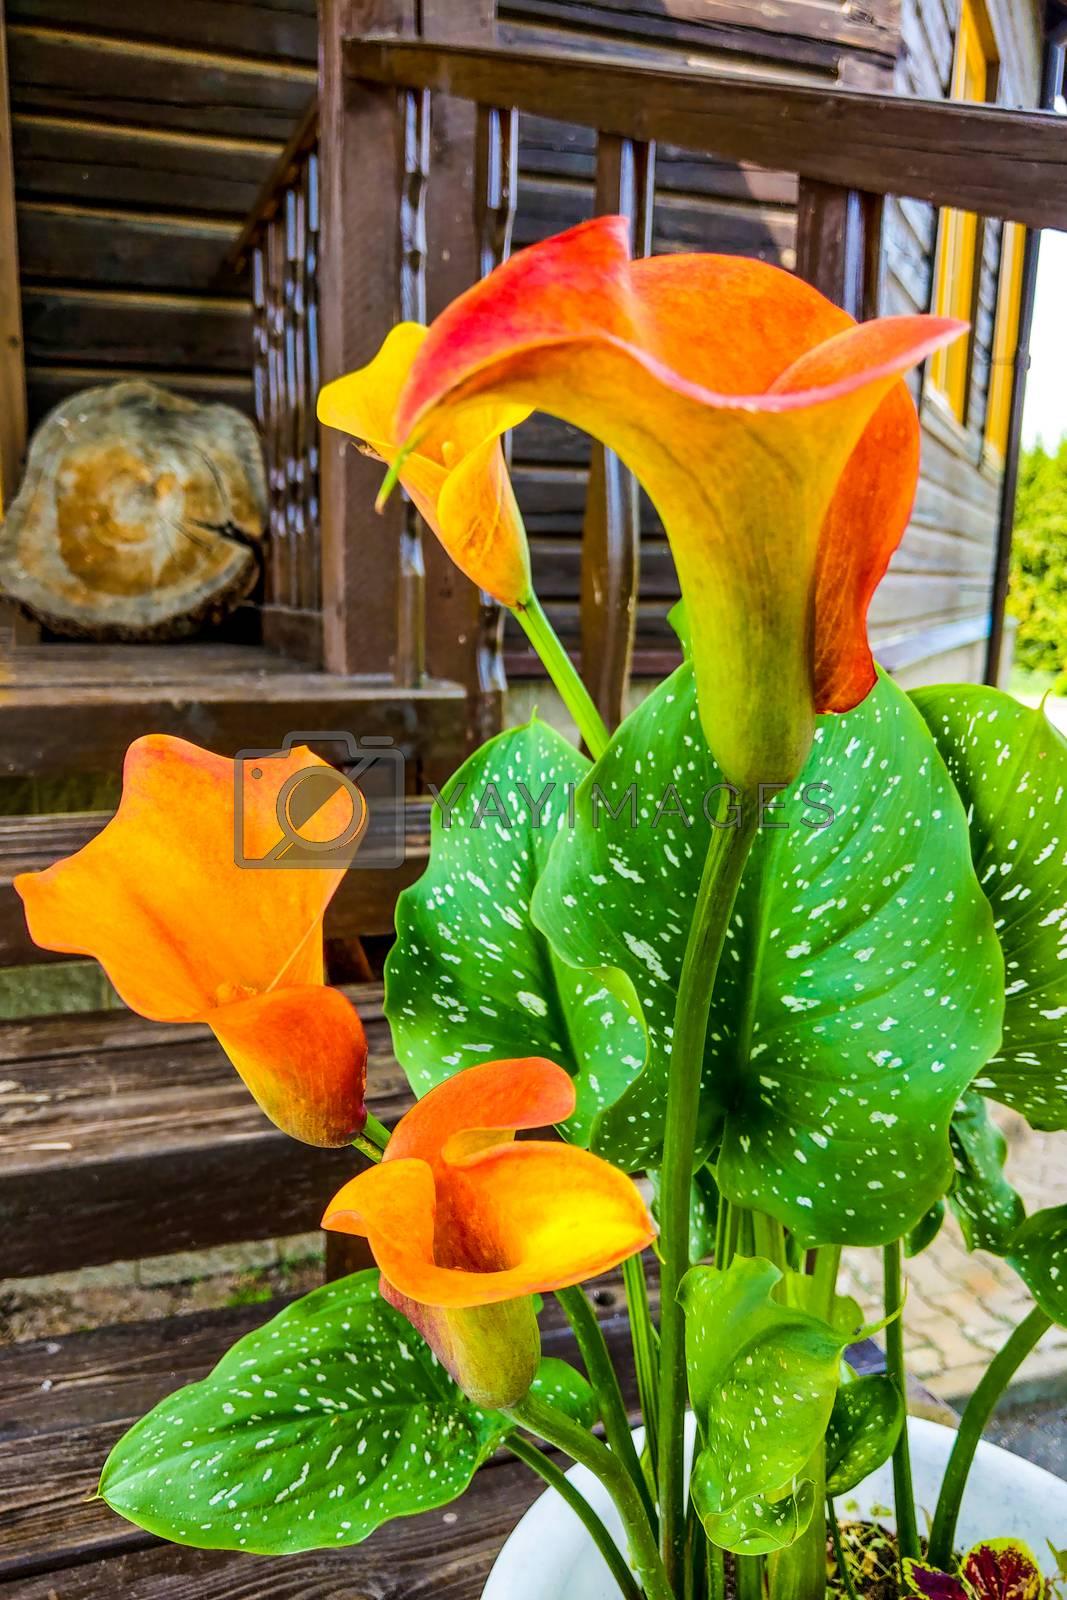 Orange Calla Lilies on plants in the garden